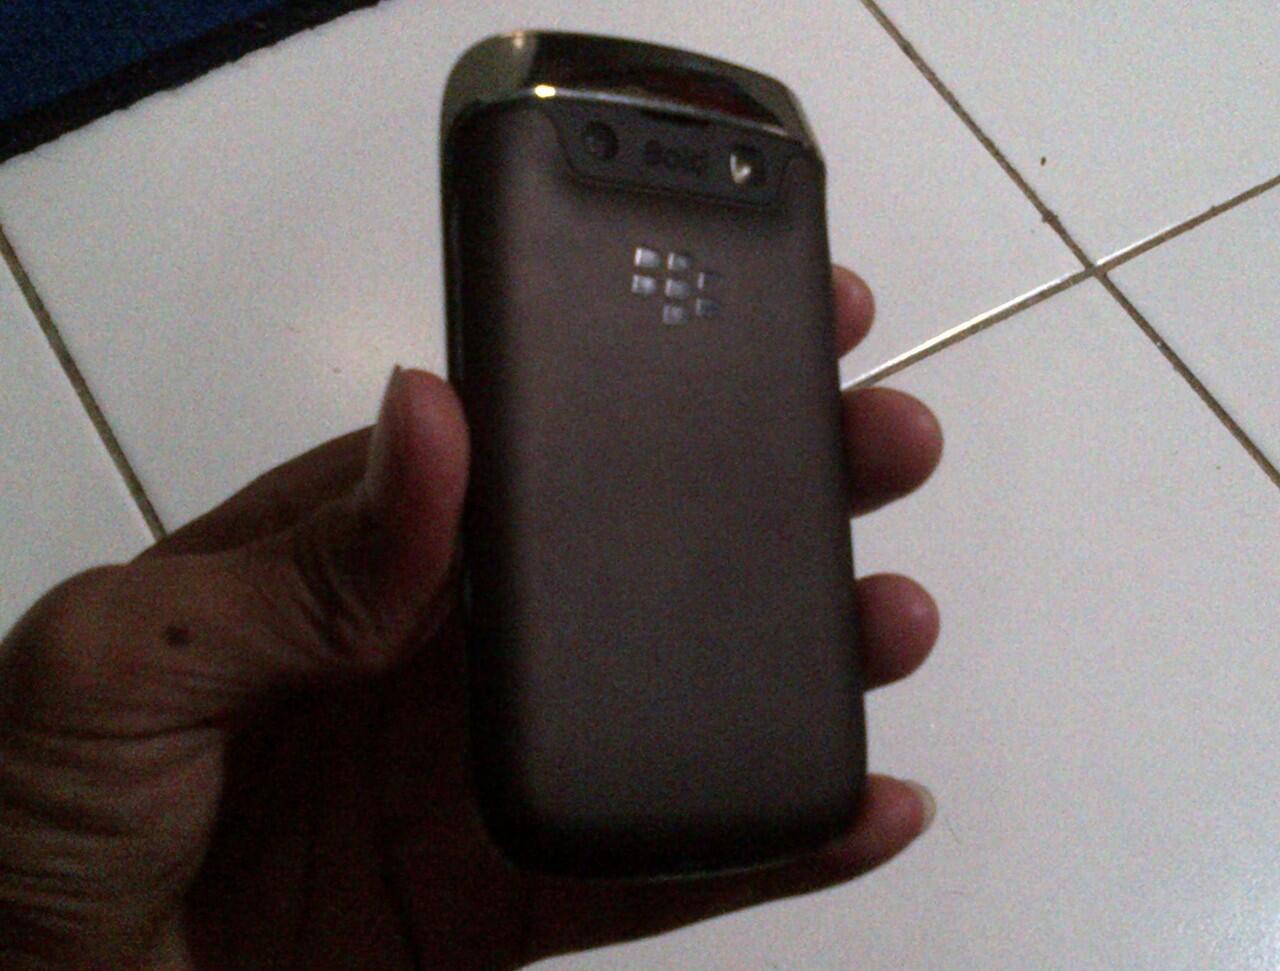 Jual Cepat blackberry 9790 bb bellagio a.k.a onyx 3 masih garansi tam